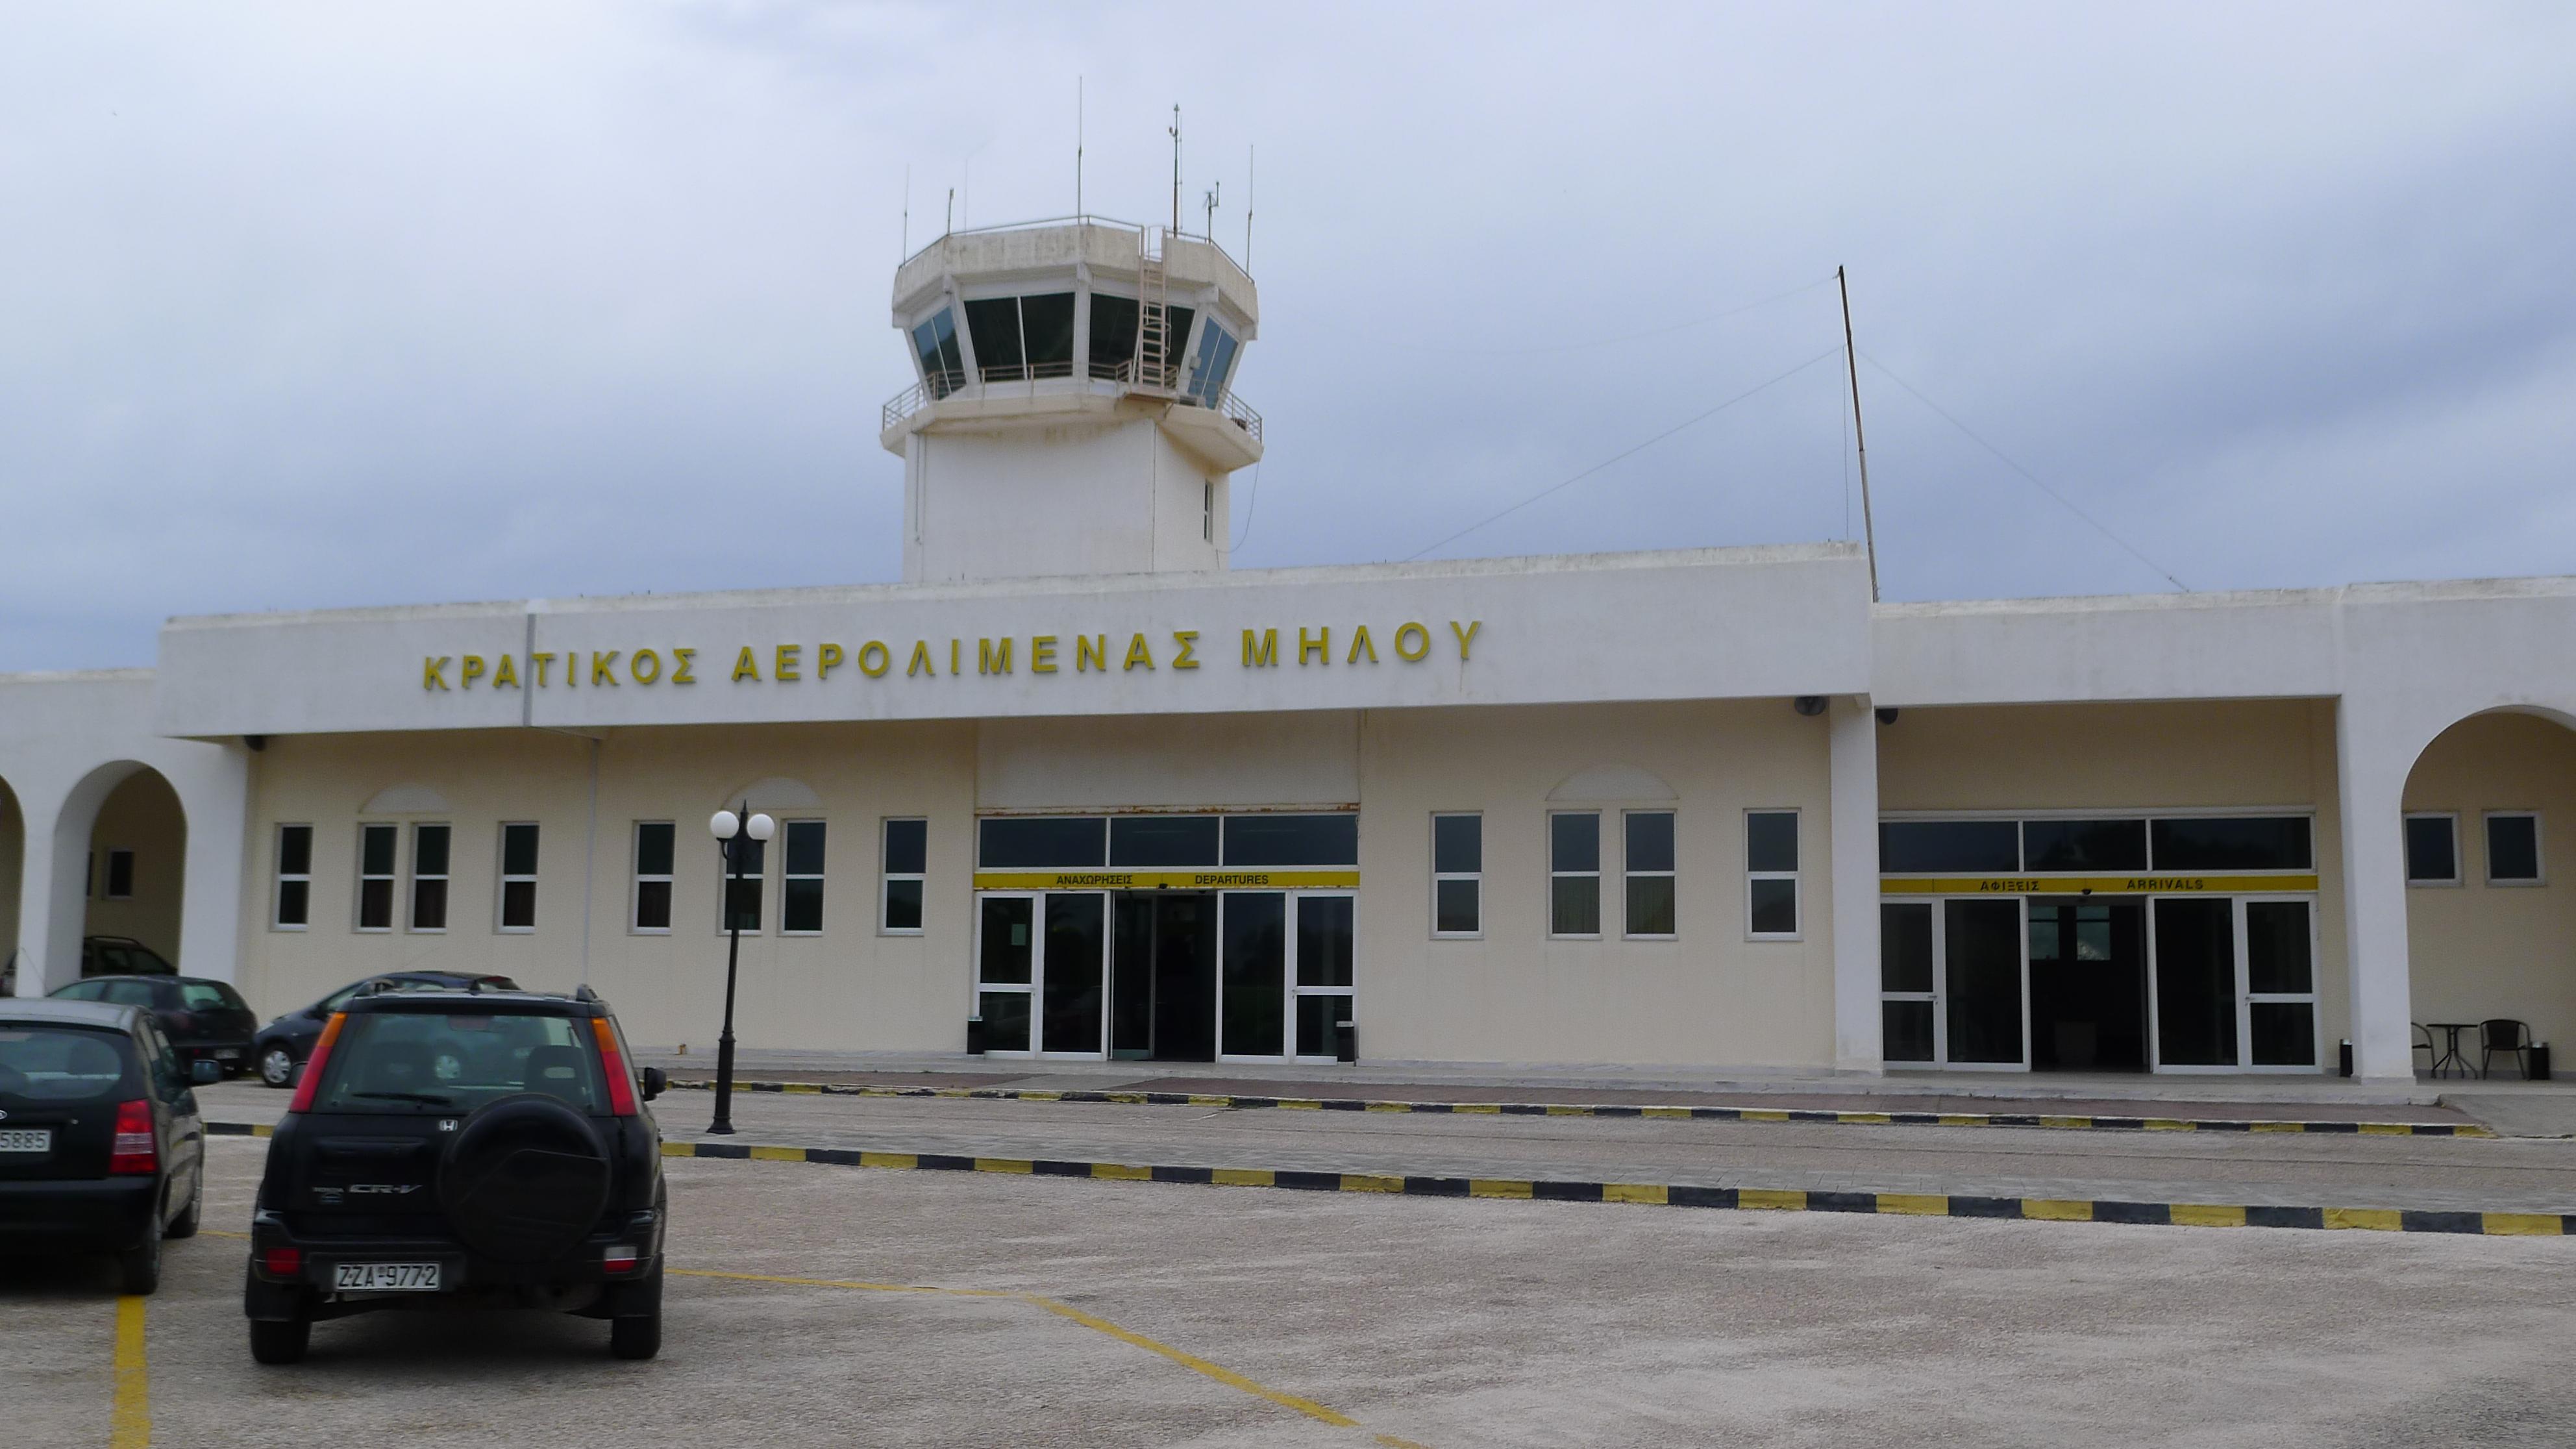 Milos airport